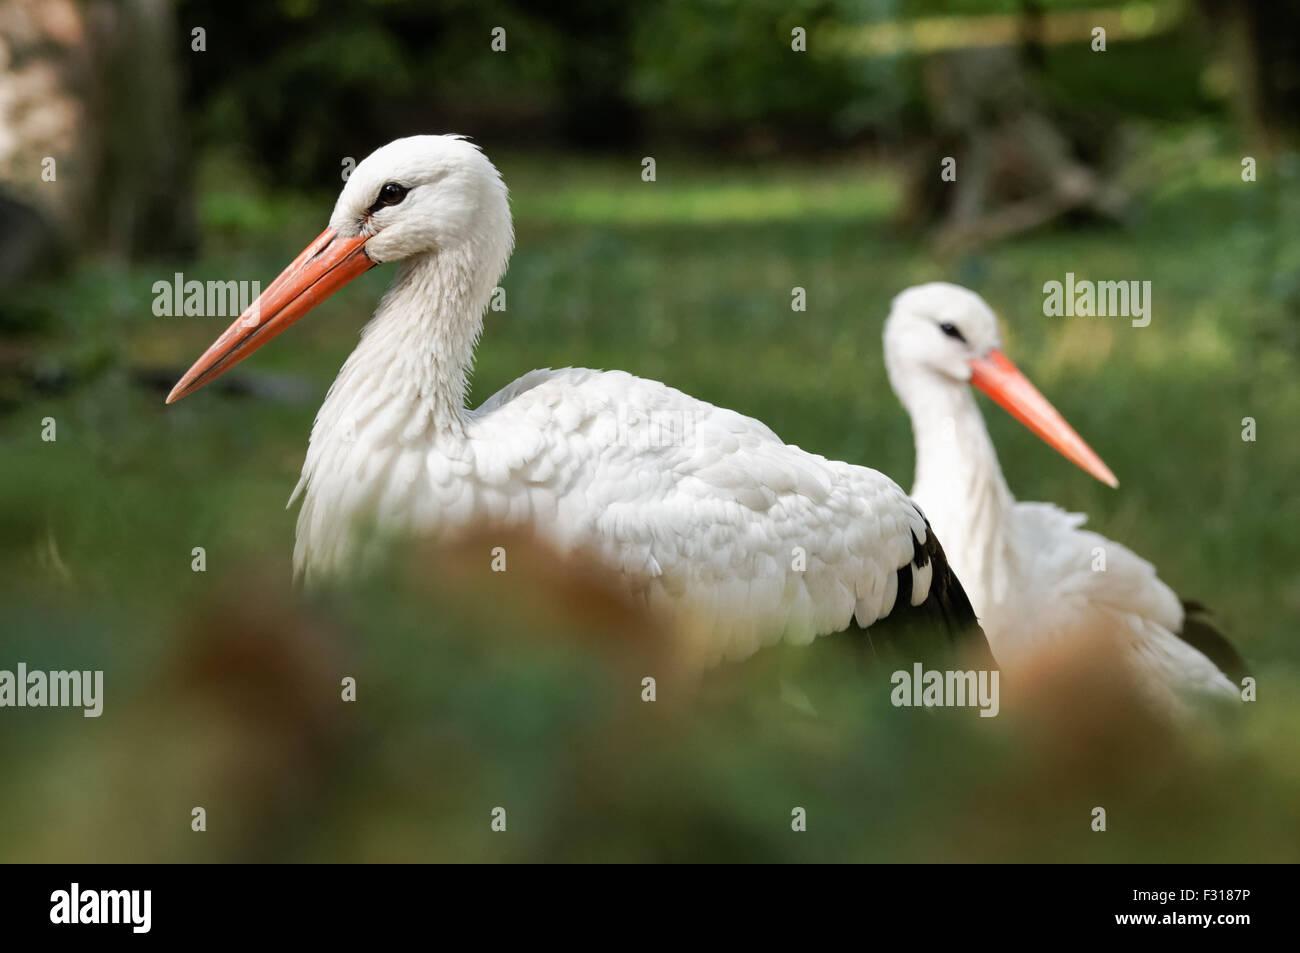 The white stork (Ciconia ciconia) - Stock Image